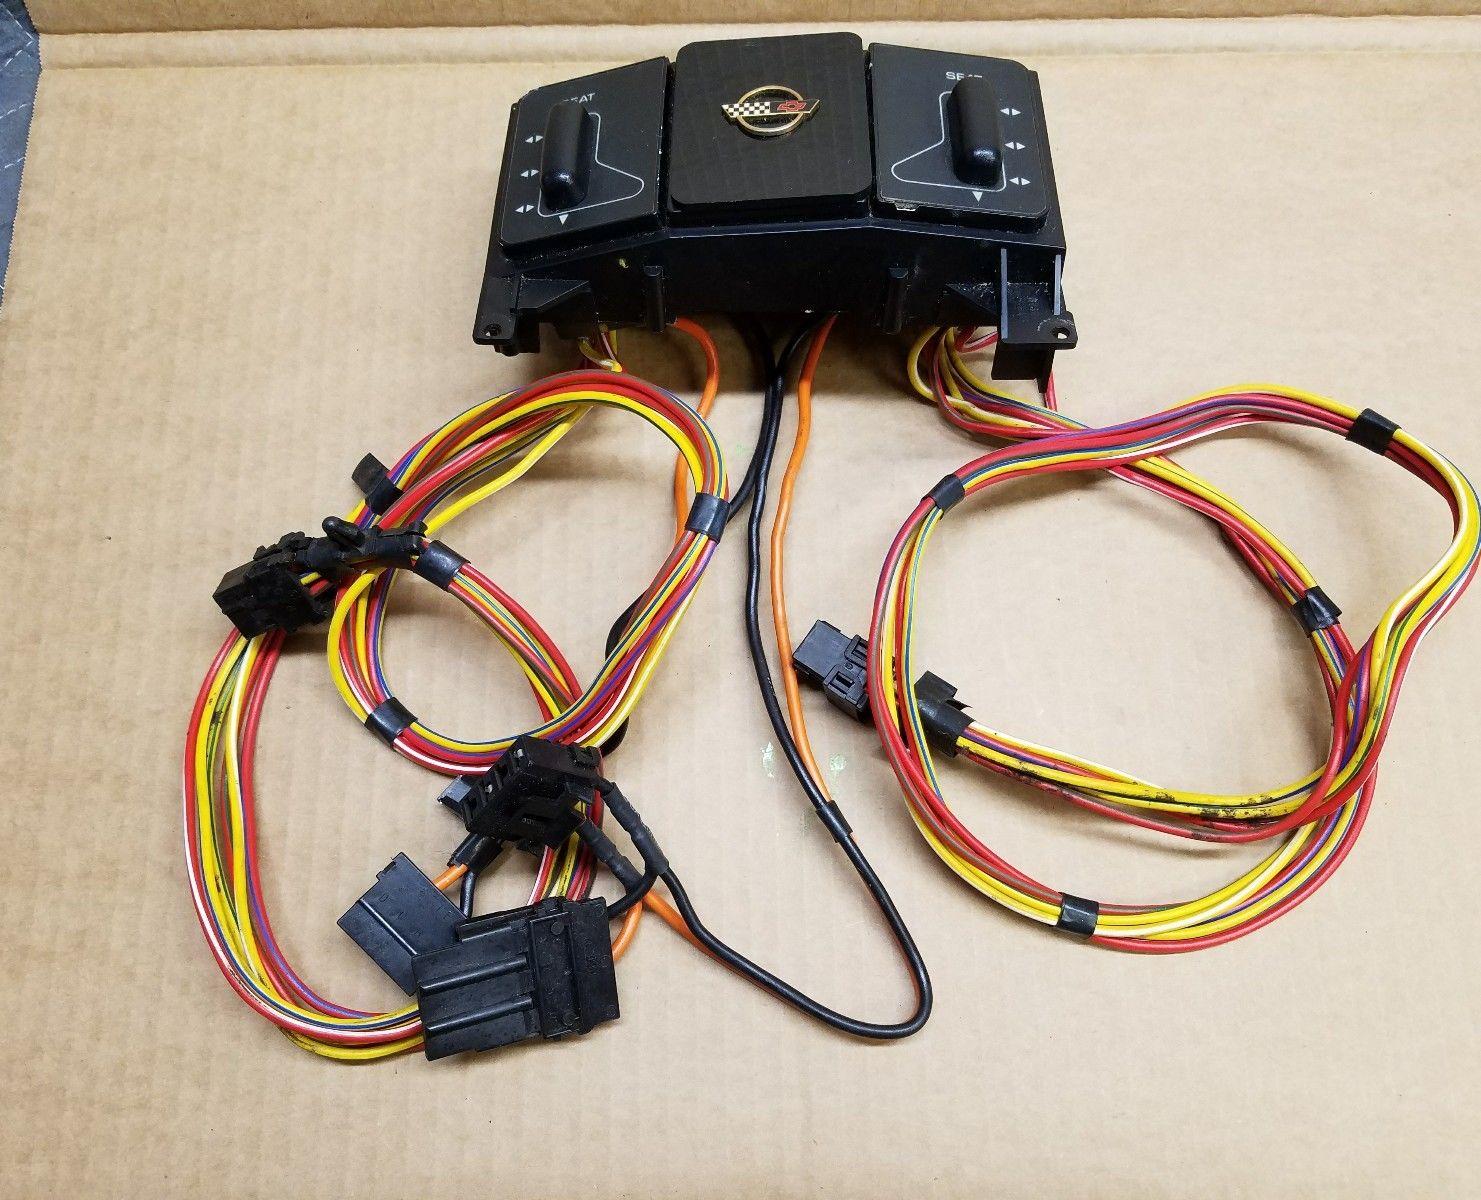 hight resolution of power seat wiring diagram 94 96 corvetteforum chevrolet c4 corvette power seat wiring diagram